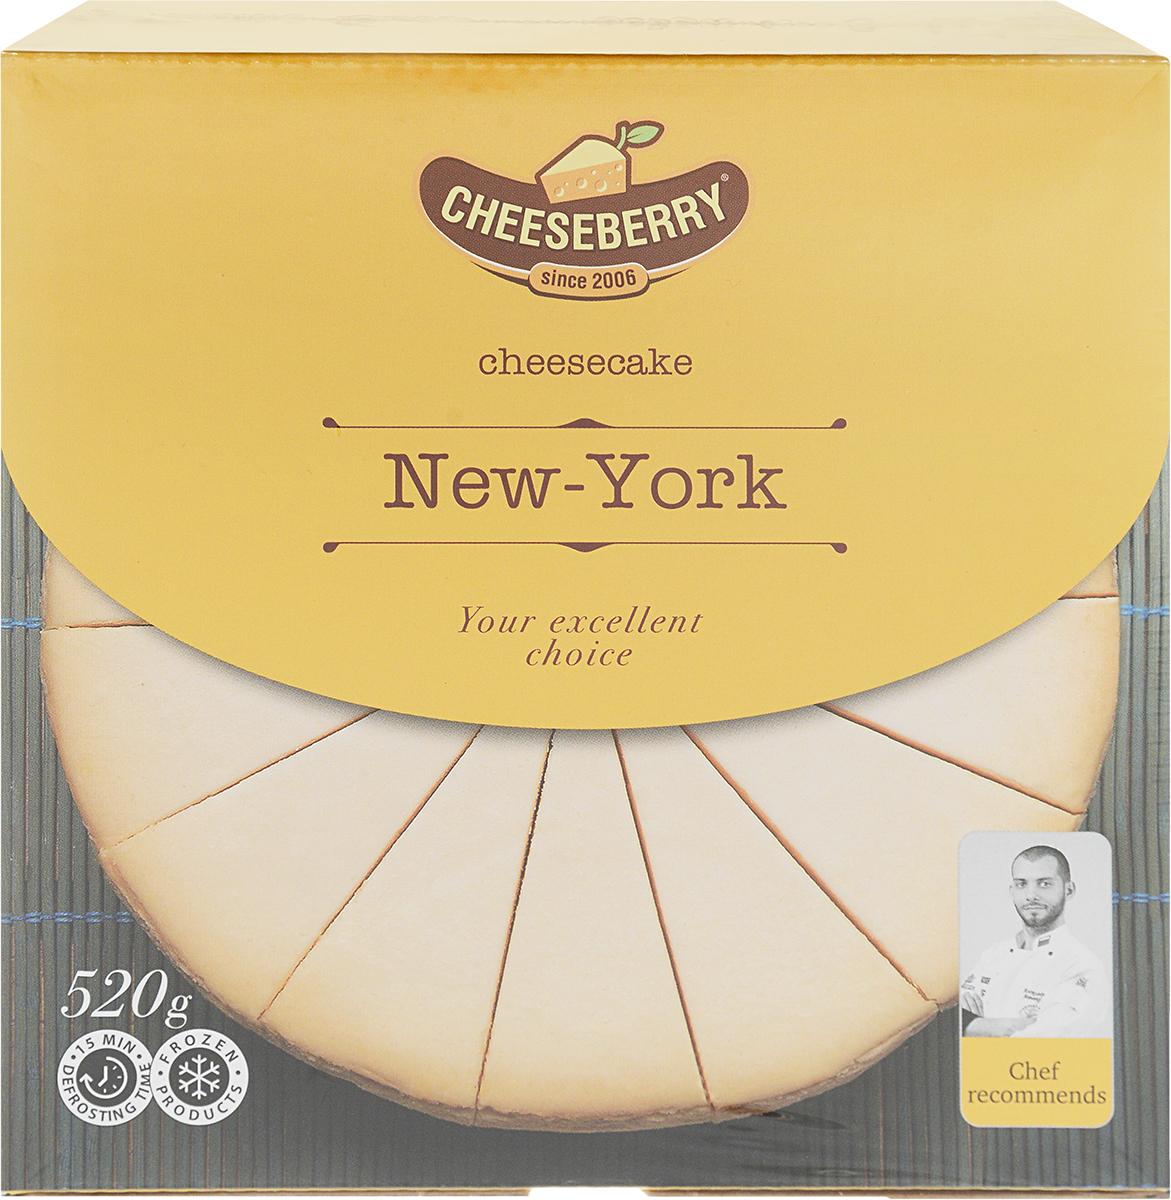 Cheeseberry Чизкейк New-York, 520 г недорого